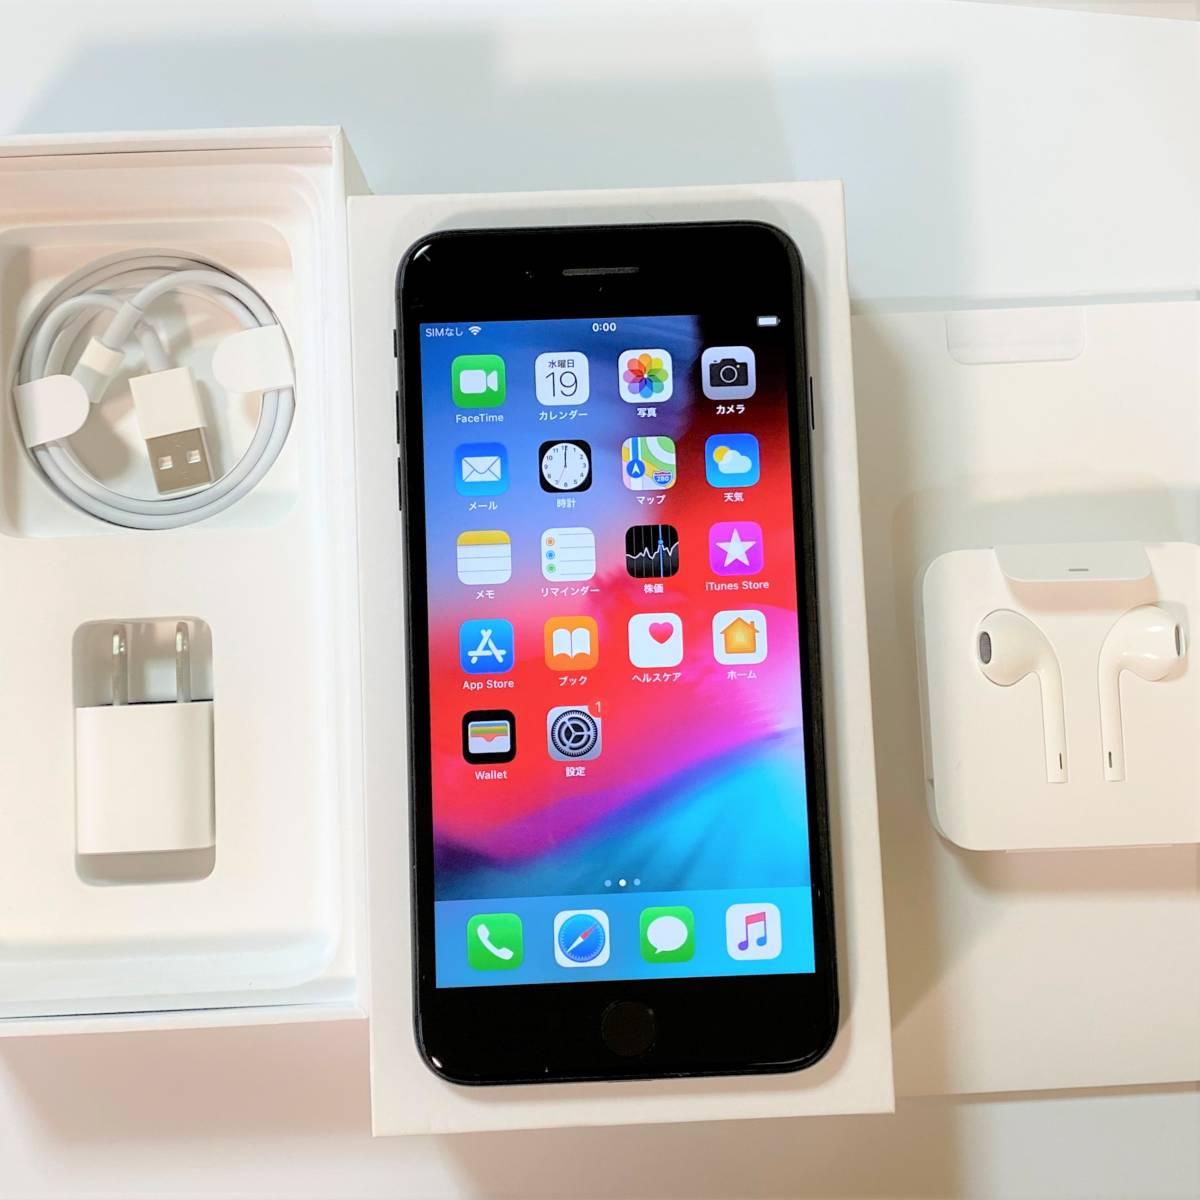 Apple 国内版 正規 SIMフリー iPhone 7 Plus ブラック 128GB MN6F2J/A docomo 格安SIM MVNO 海外利用可能 アクティベーションロック解除済